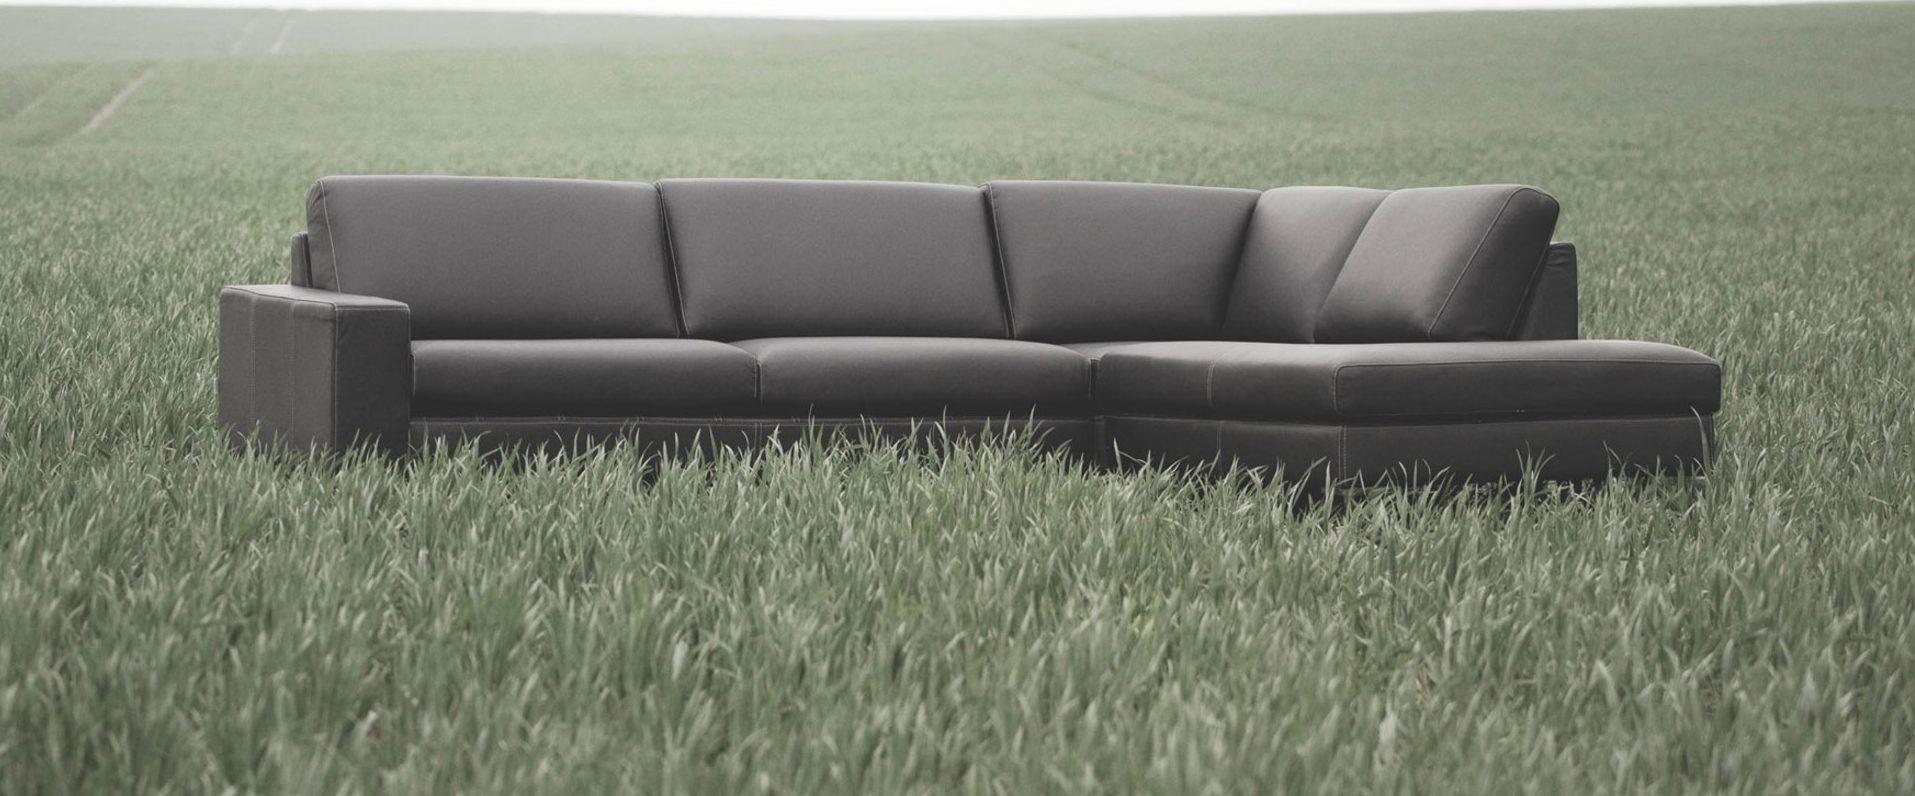 sits-quattro-ambiance